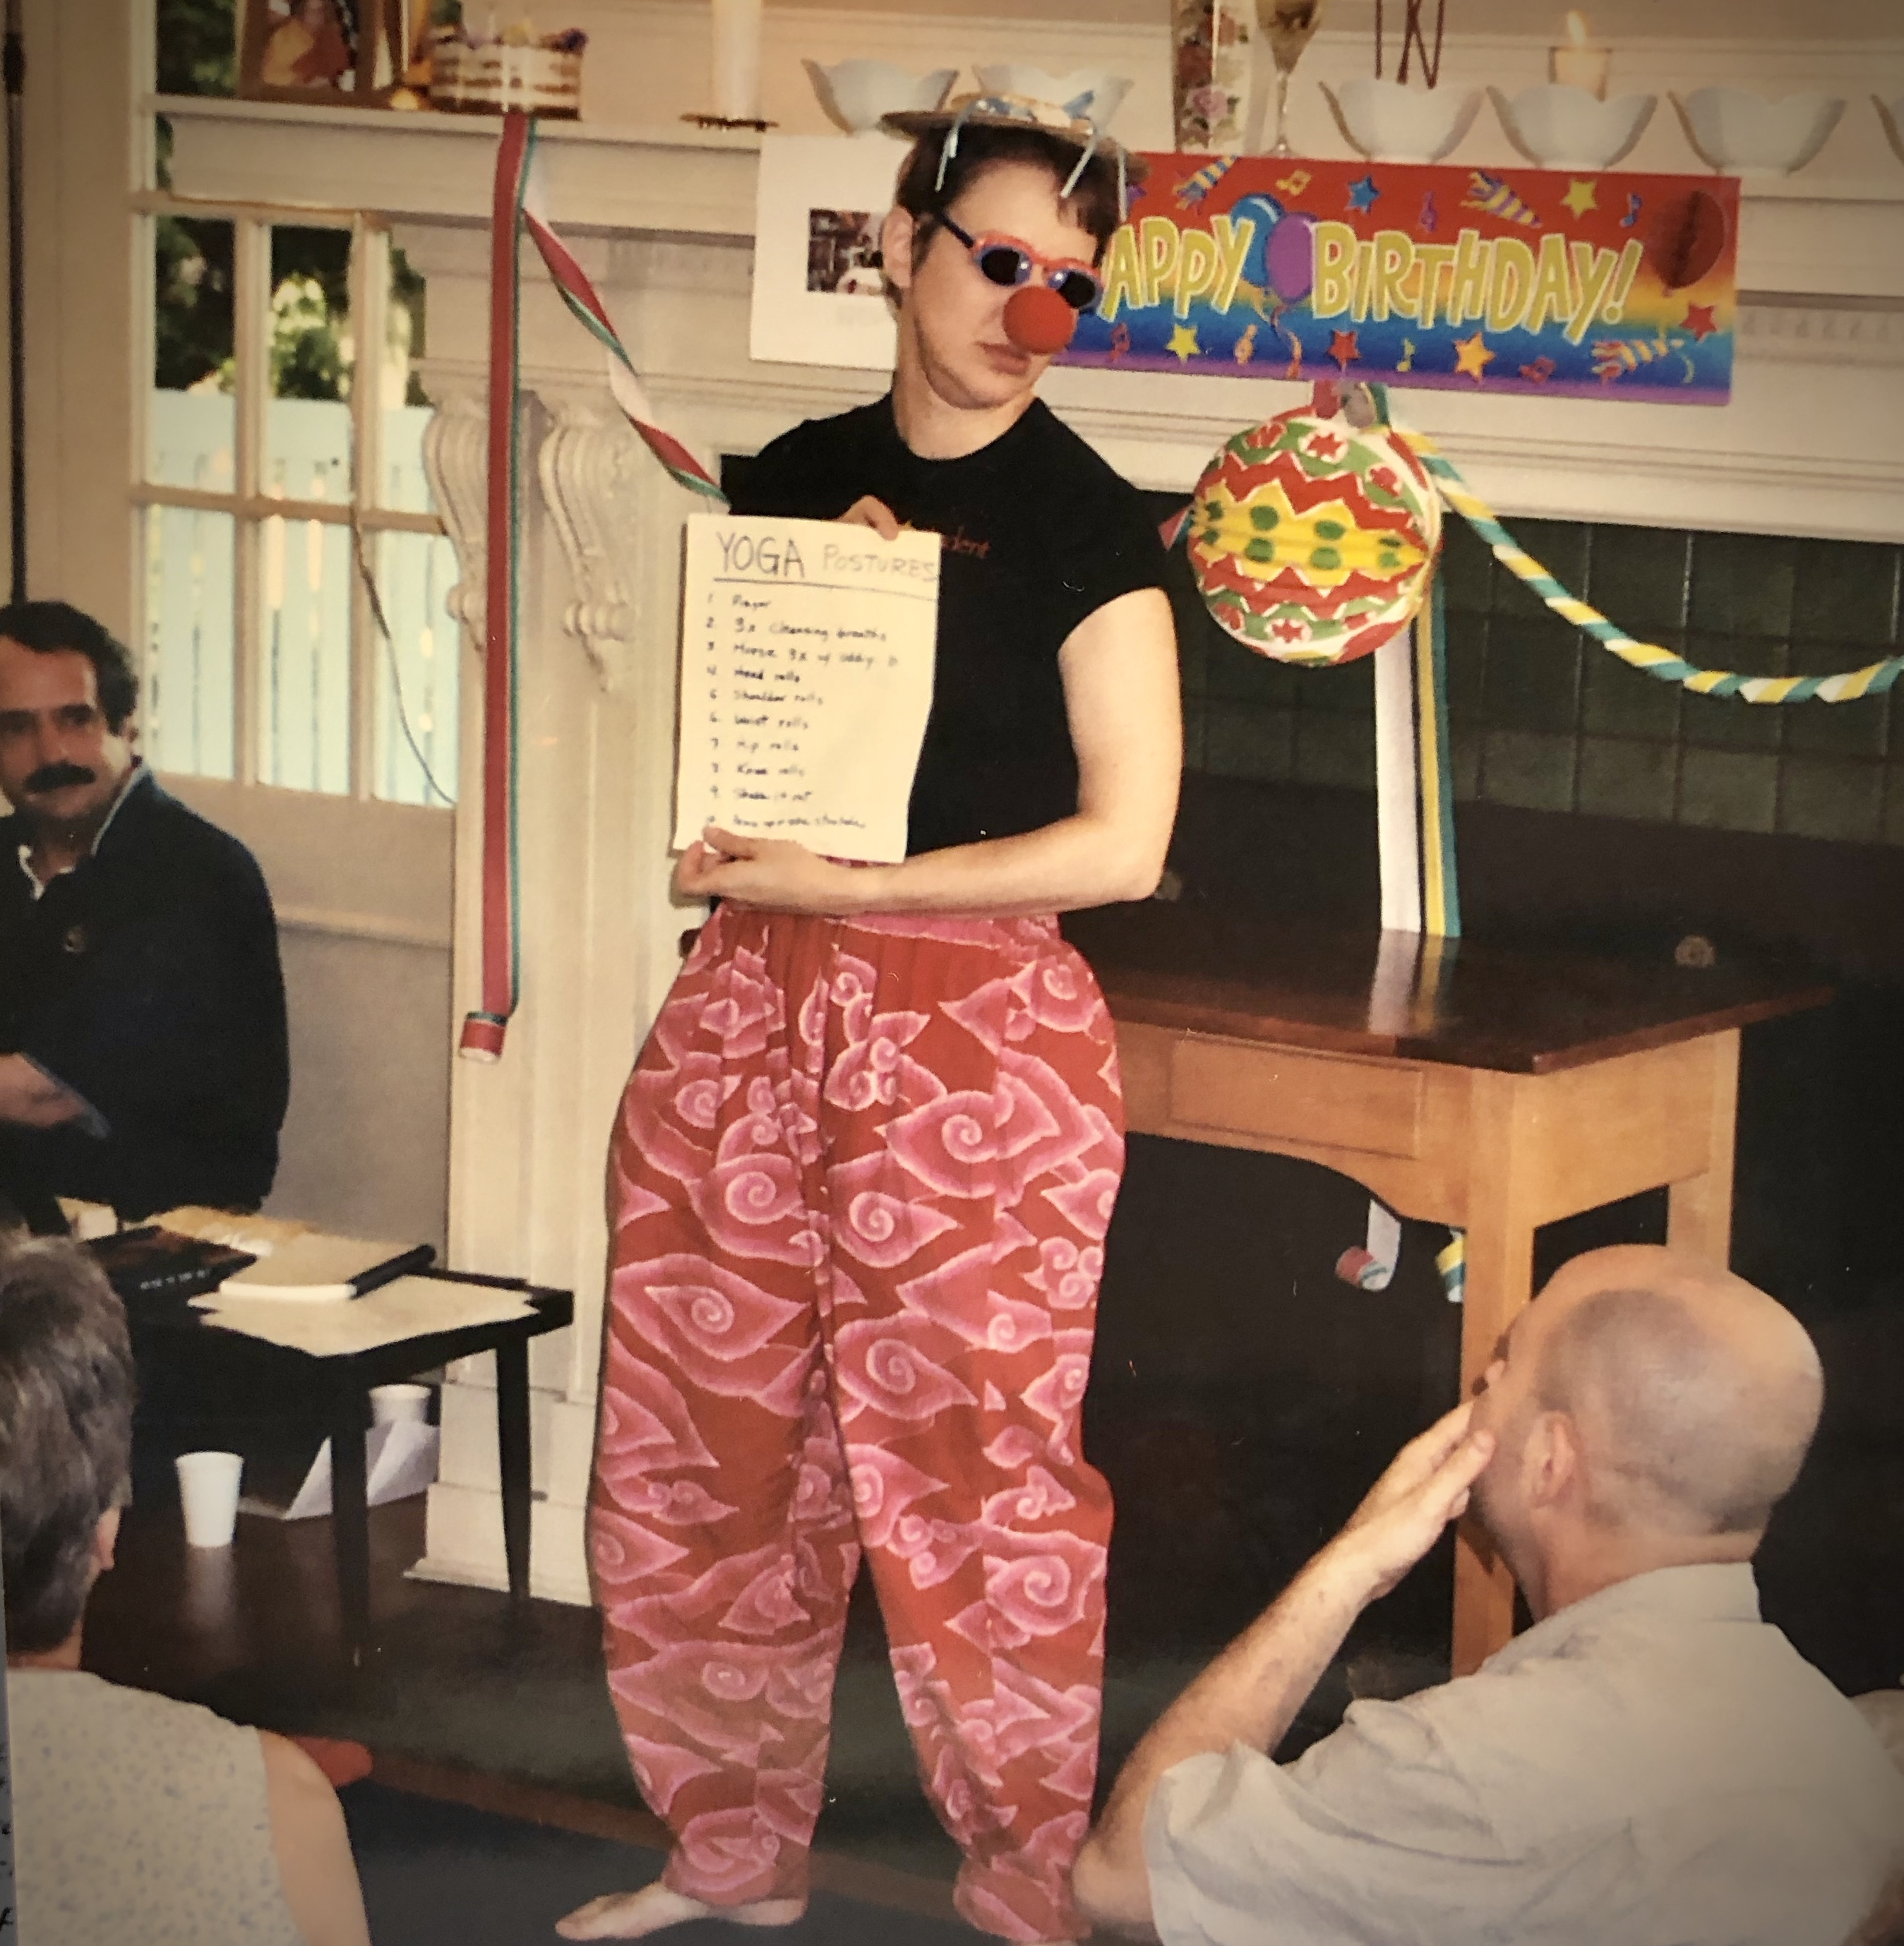 MeeMee HeeHee yoga routine, 2002